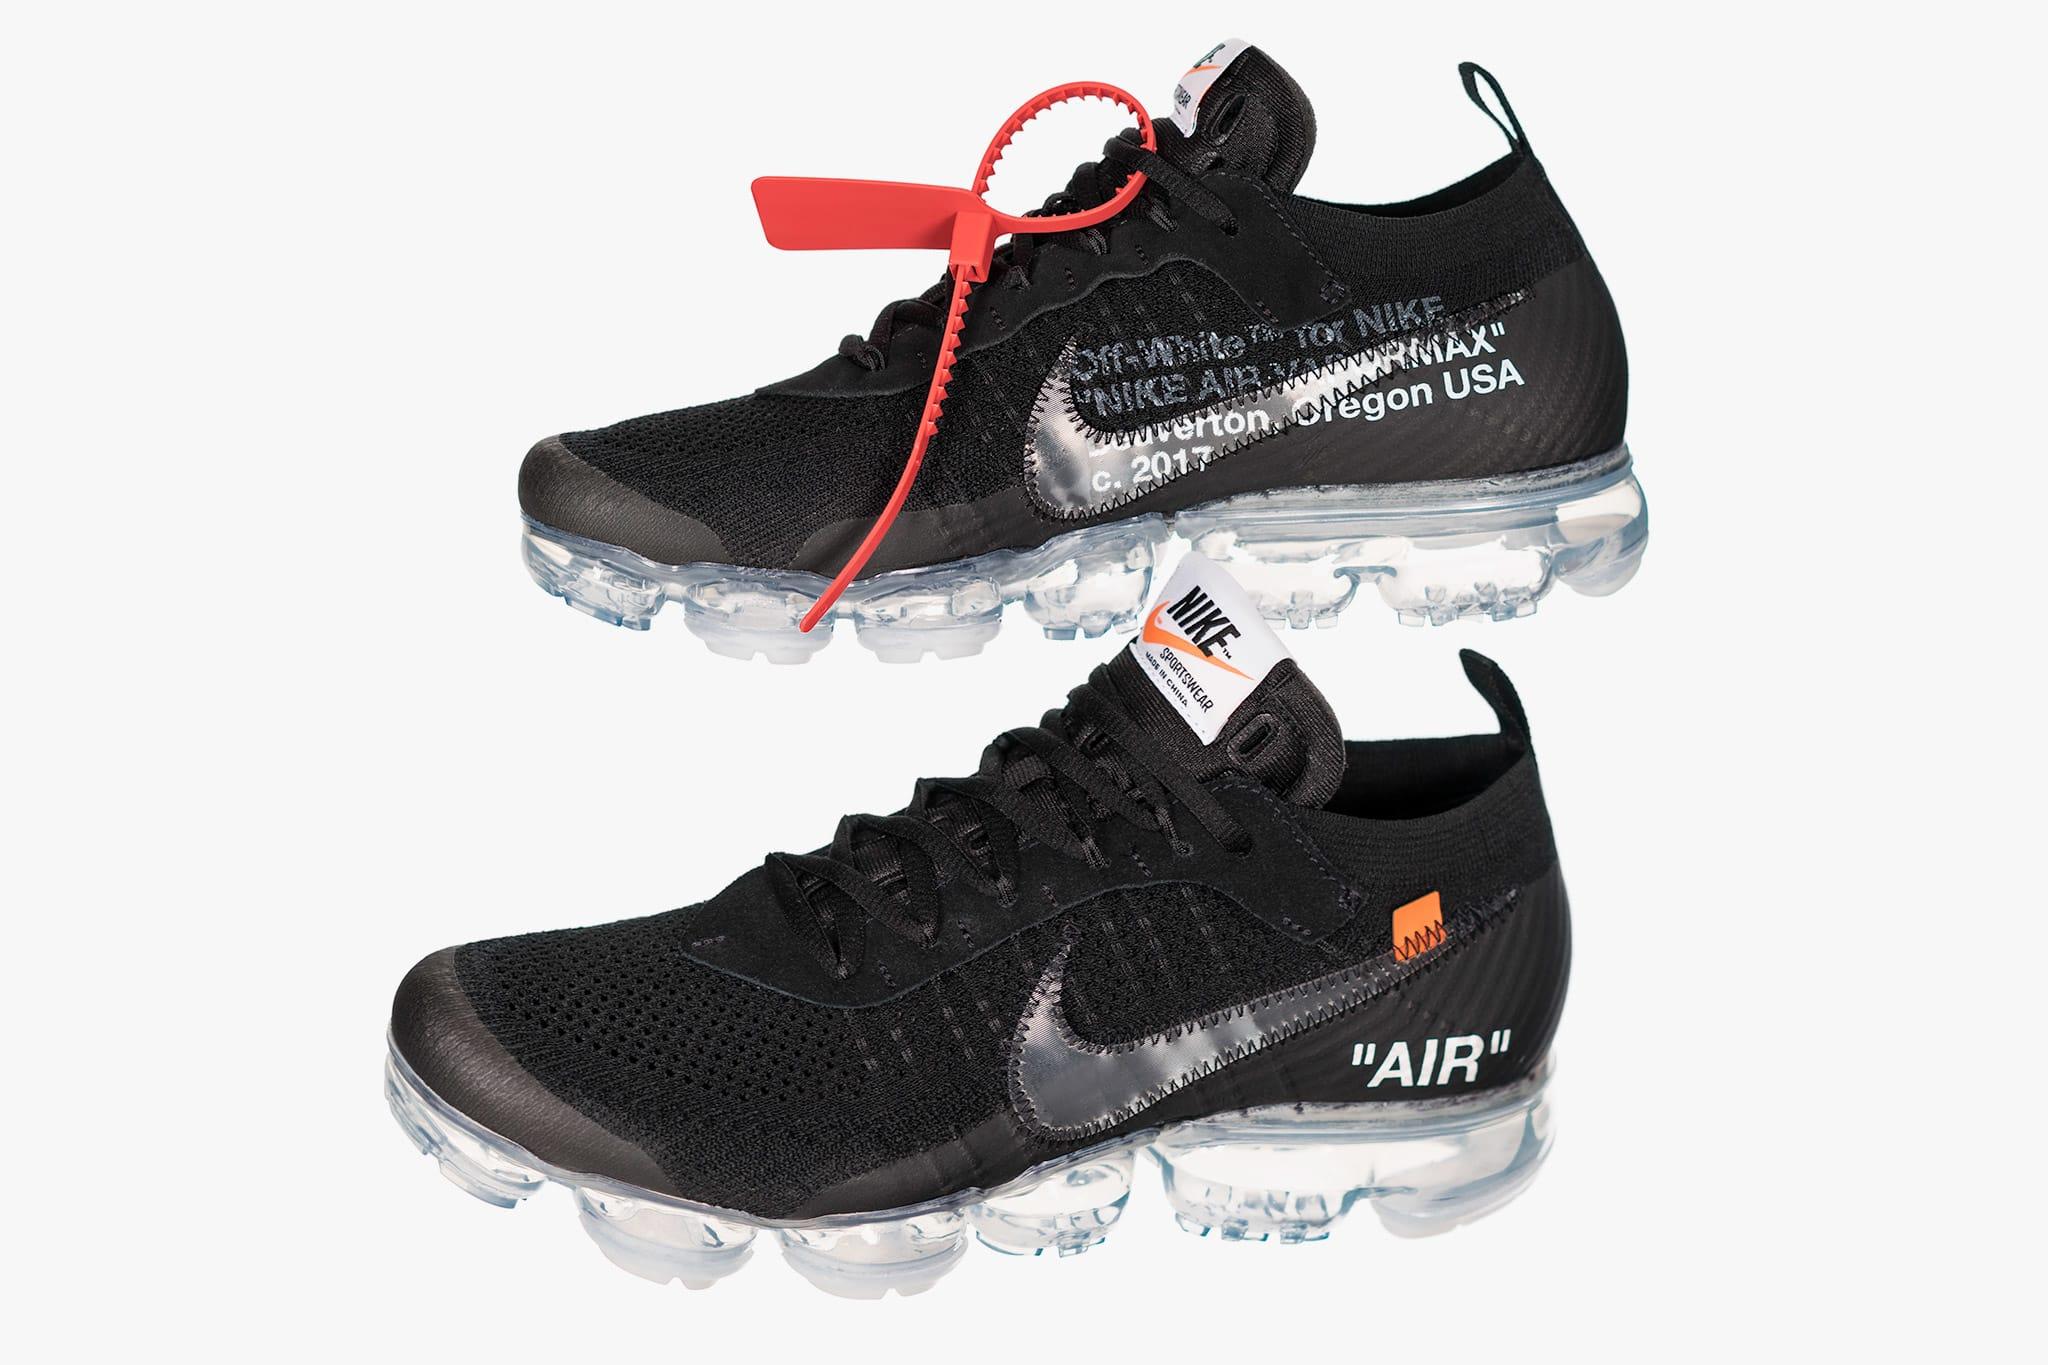 bfba0f13c043a Nike-x-Off-White-The-Ten-Air-Vapormax-FK-BLACK -CLEAR-SS18-March-News-1_yev8an.jpg